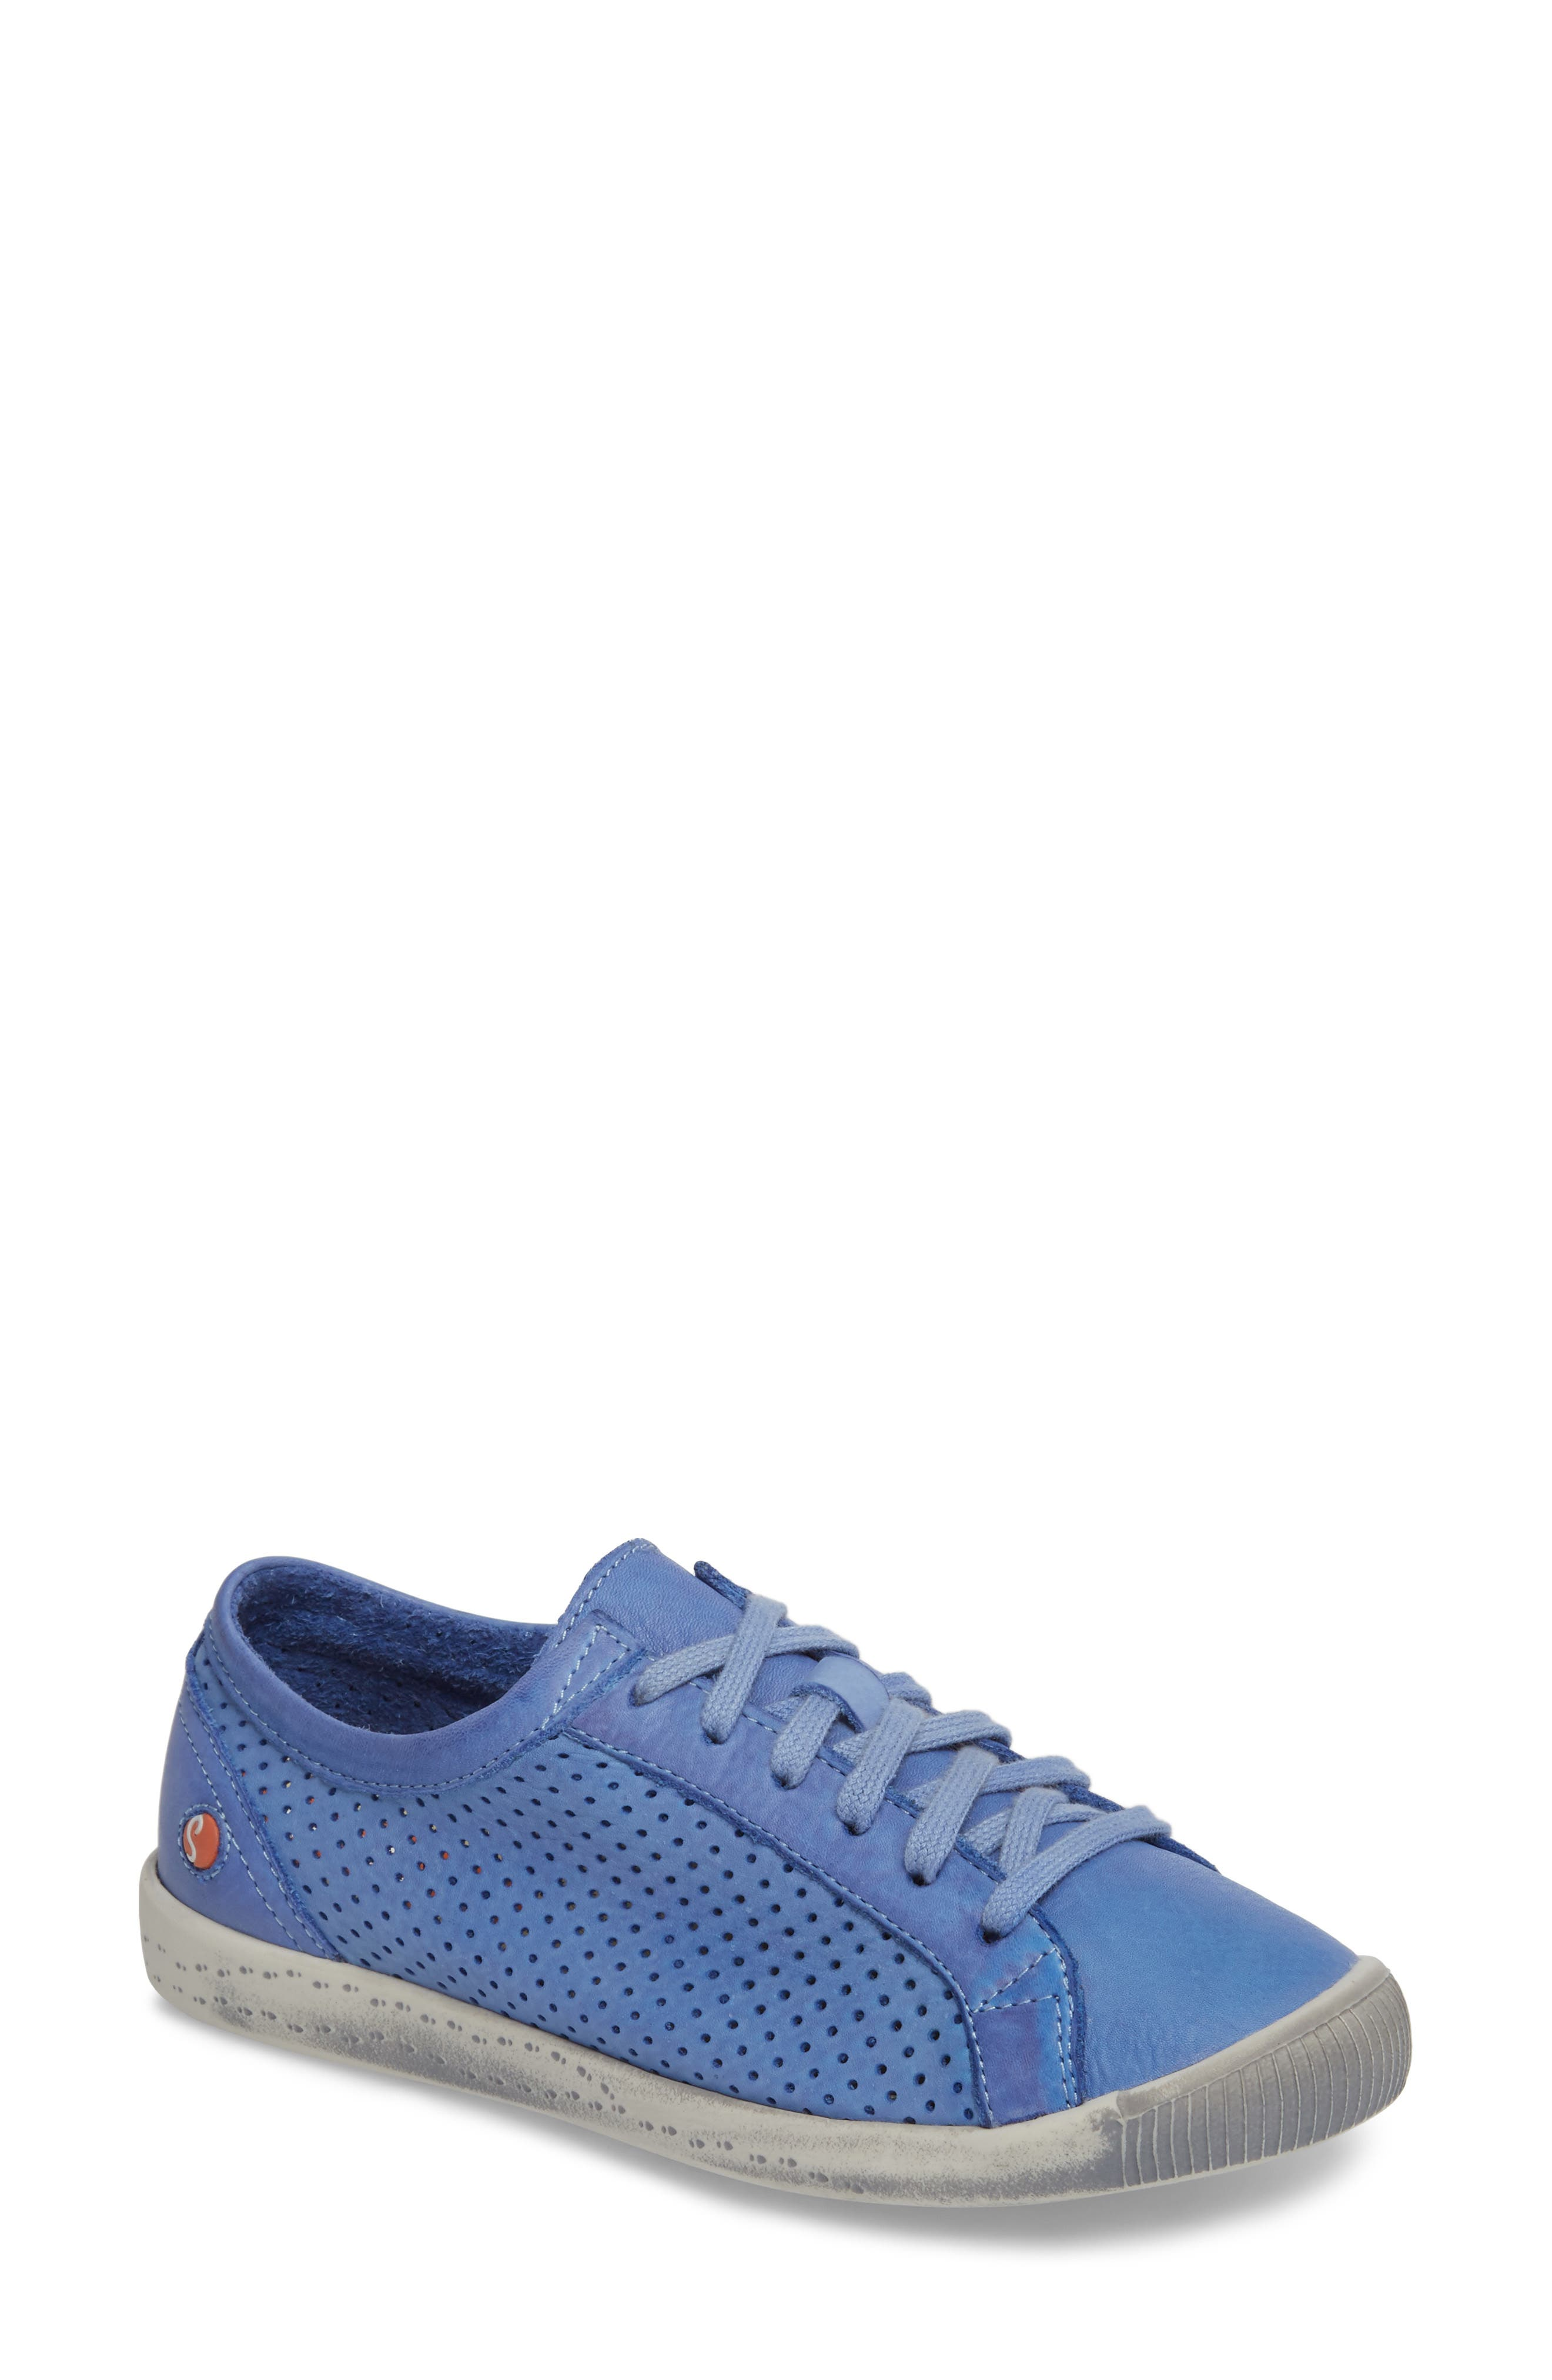 Ica Sneaker,                             Main thumbnail 3, color,